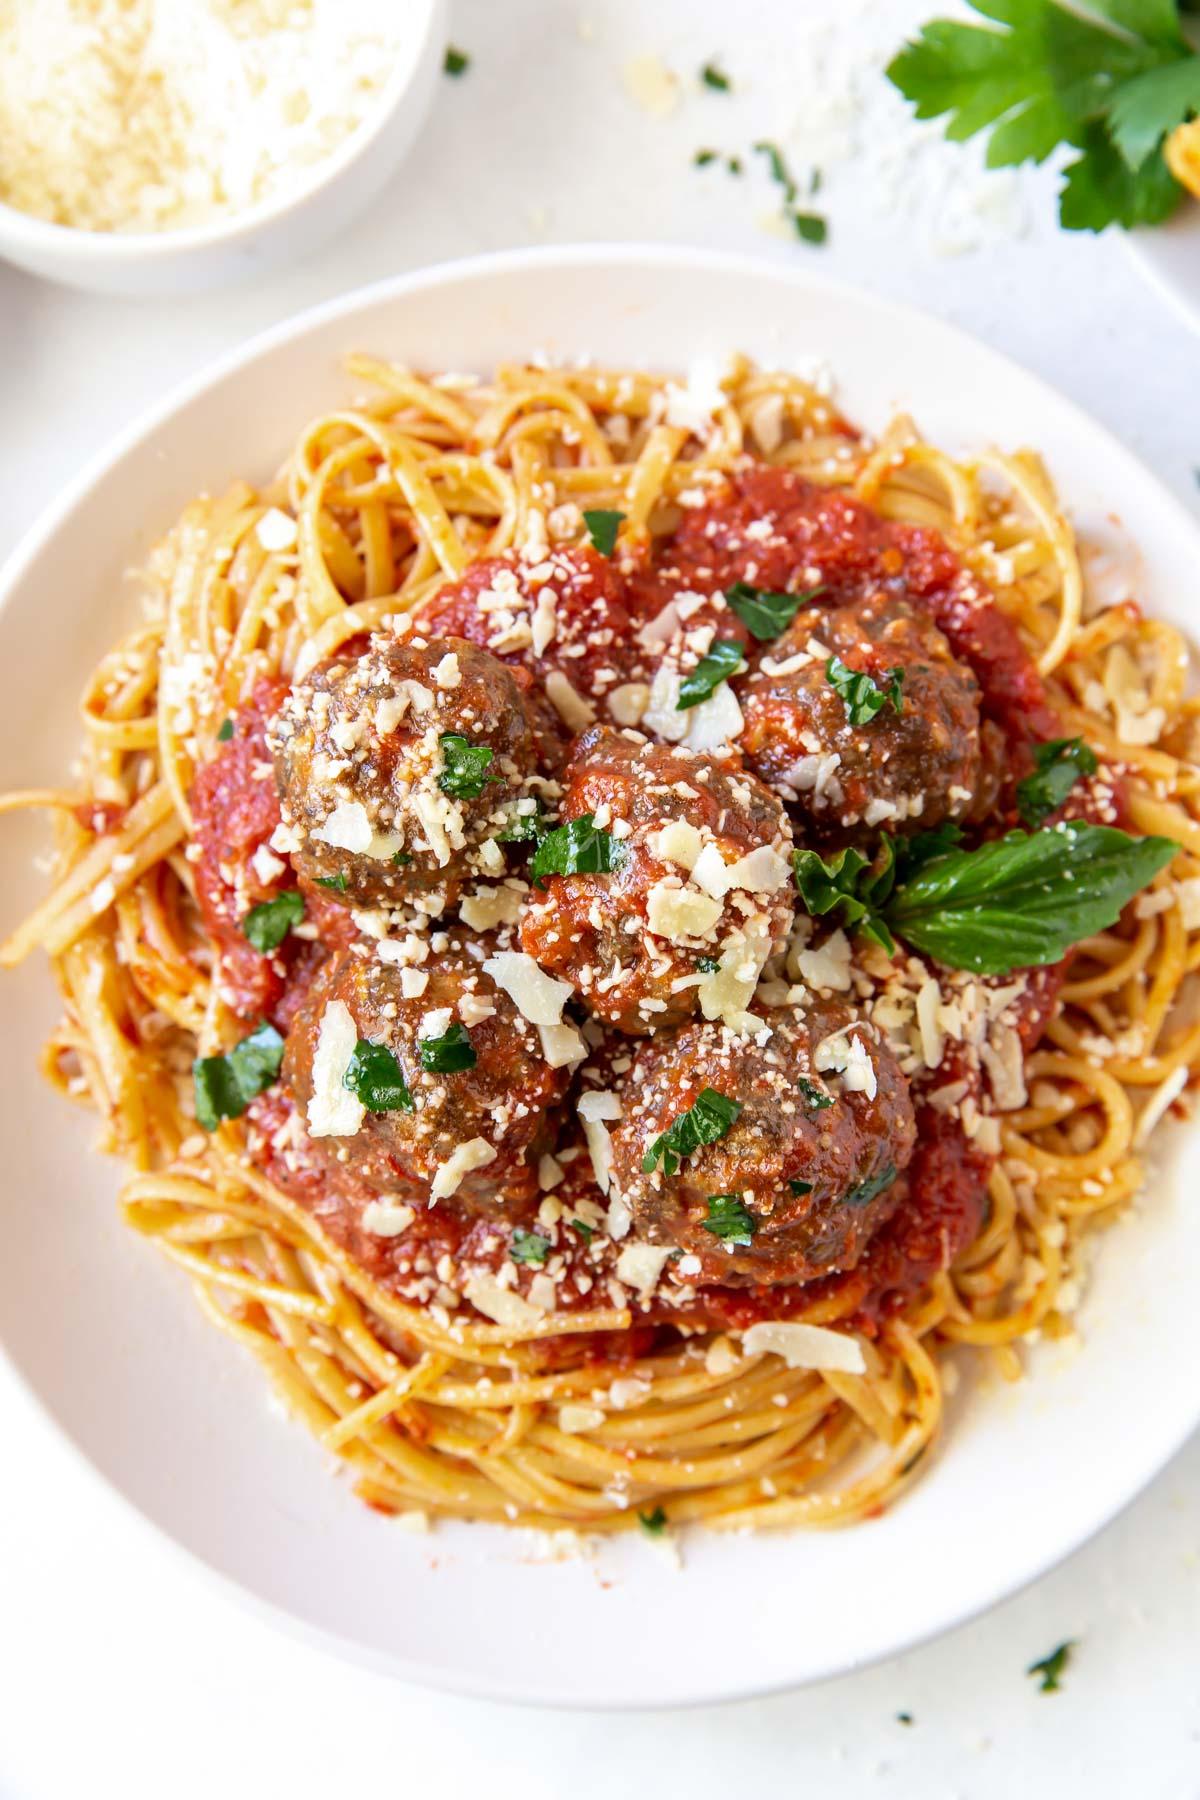 meatballs served with spaghetti and marinara sauce